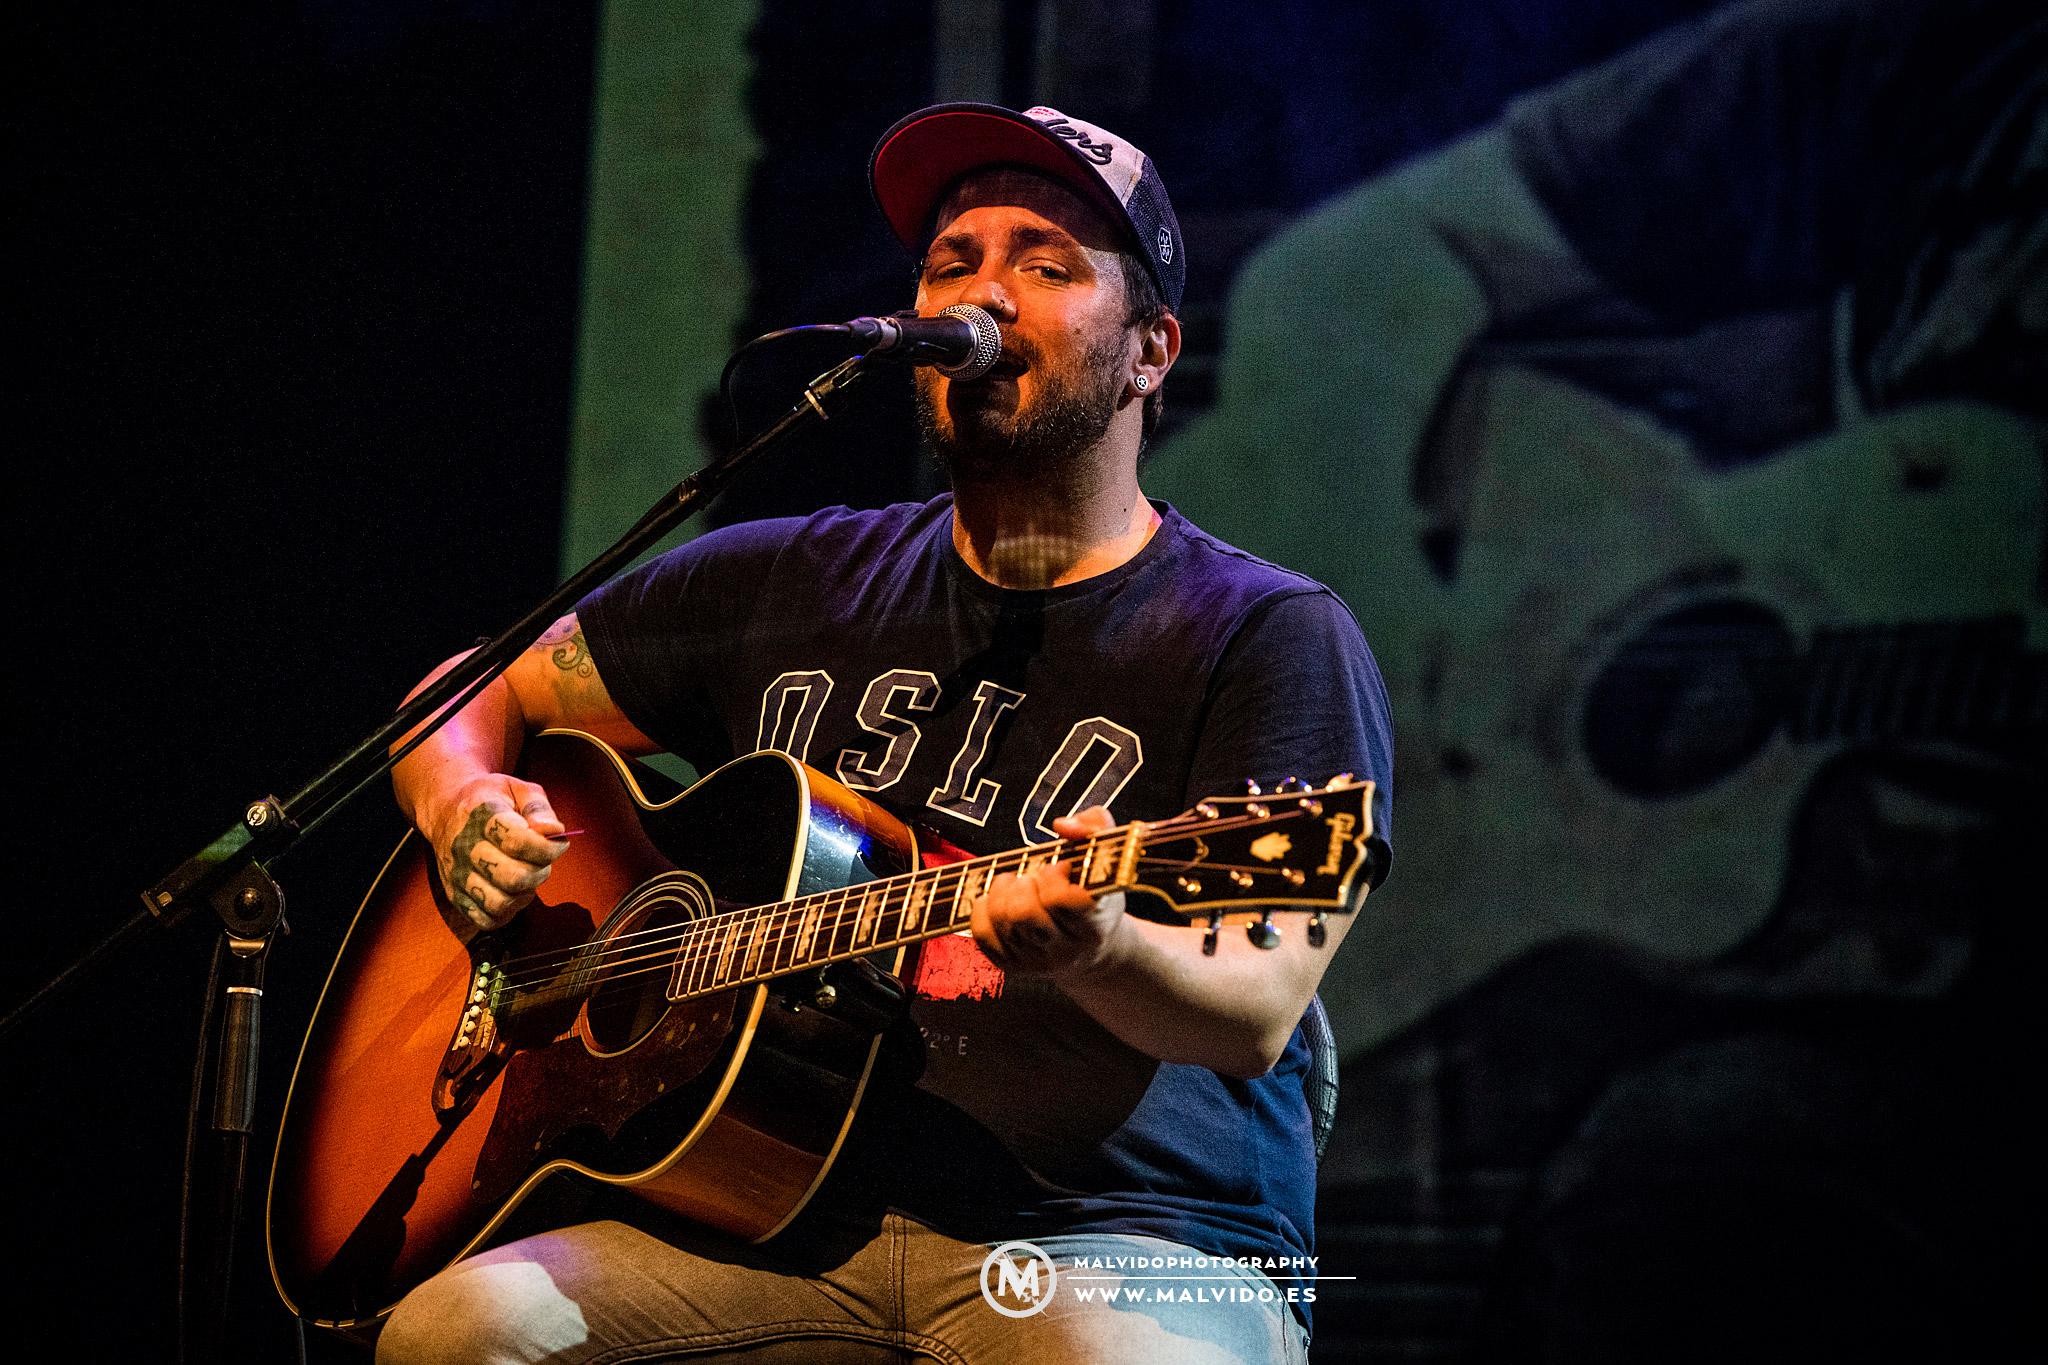 Alfredo-Iker Piedrafita